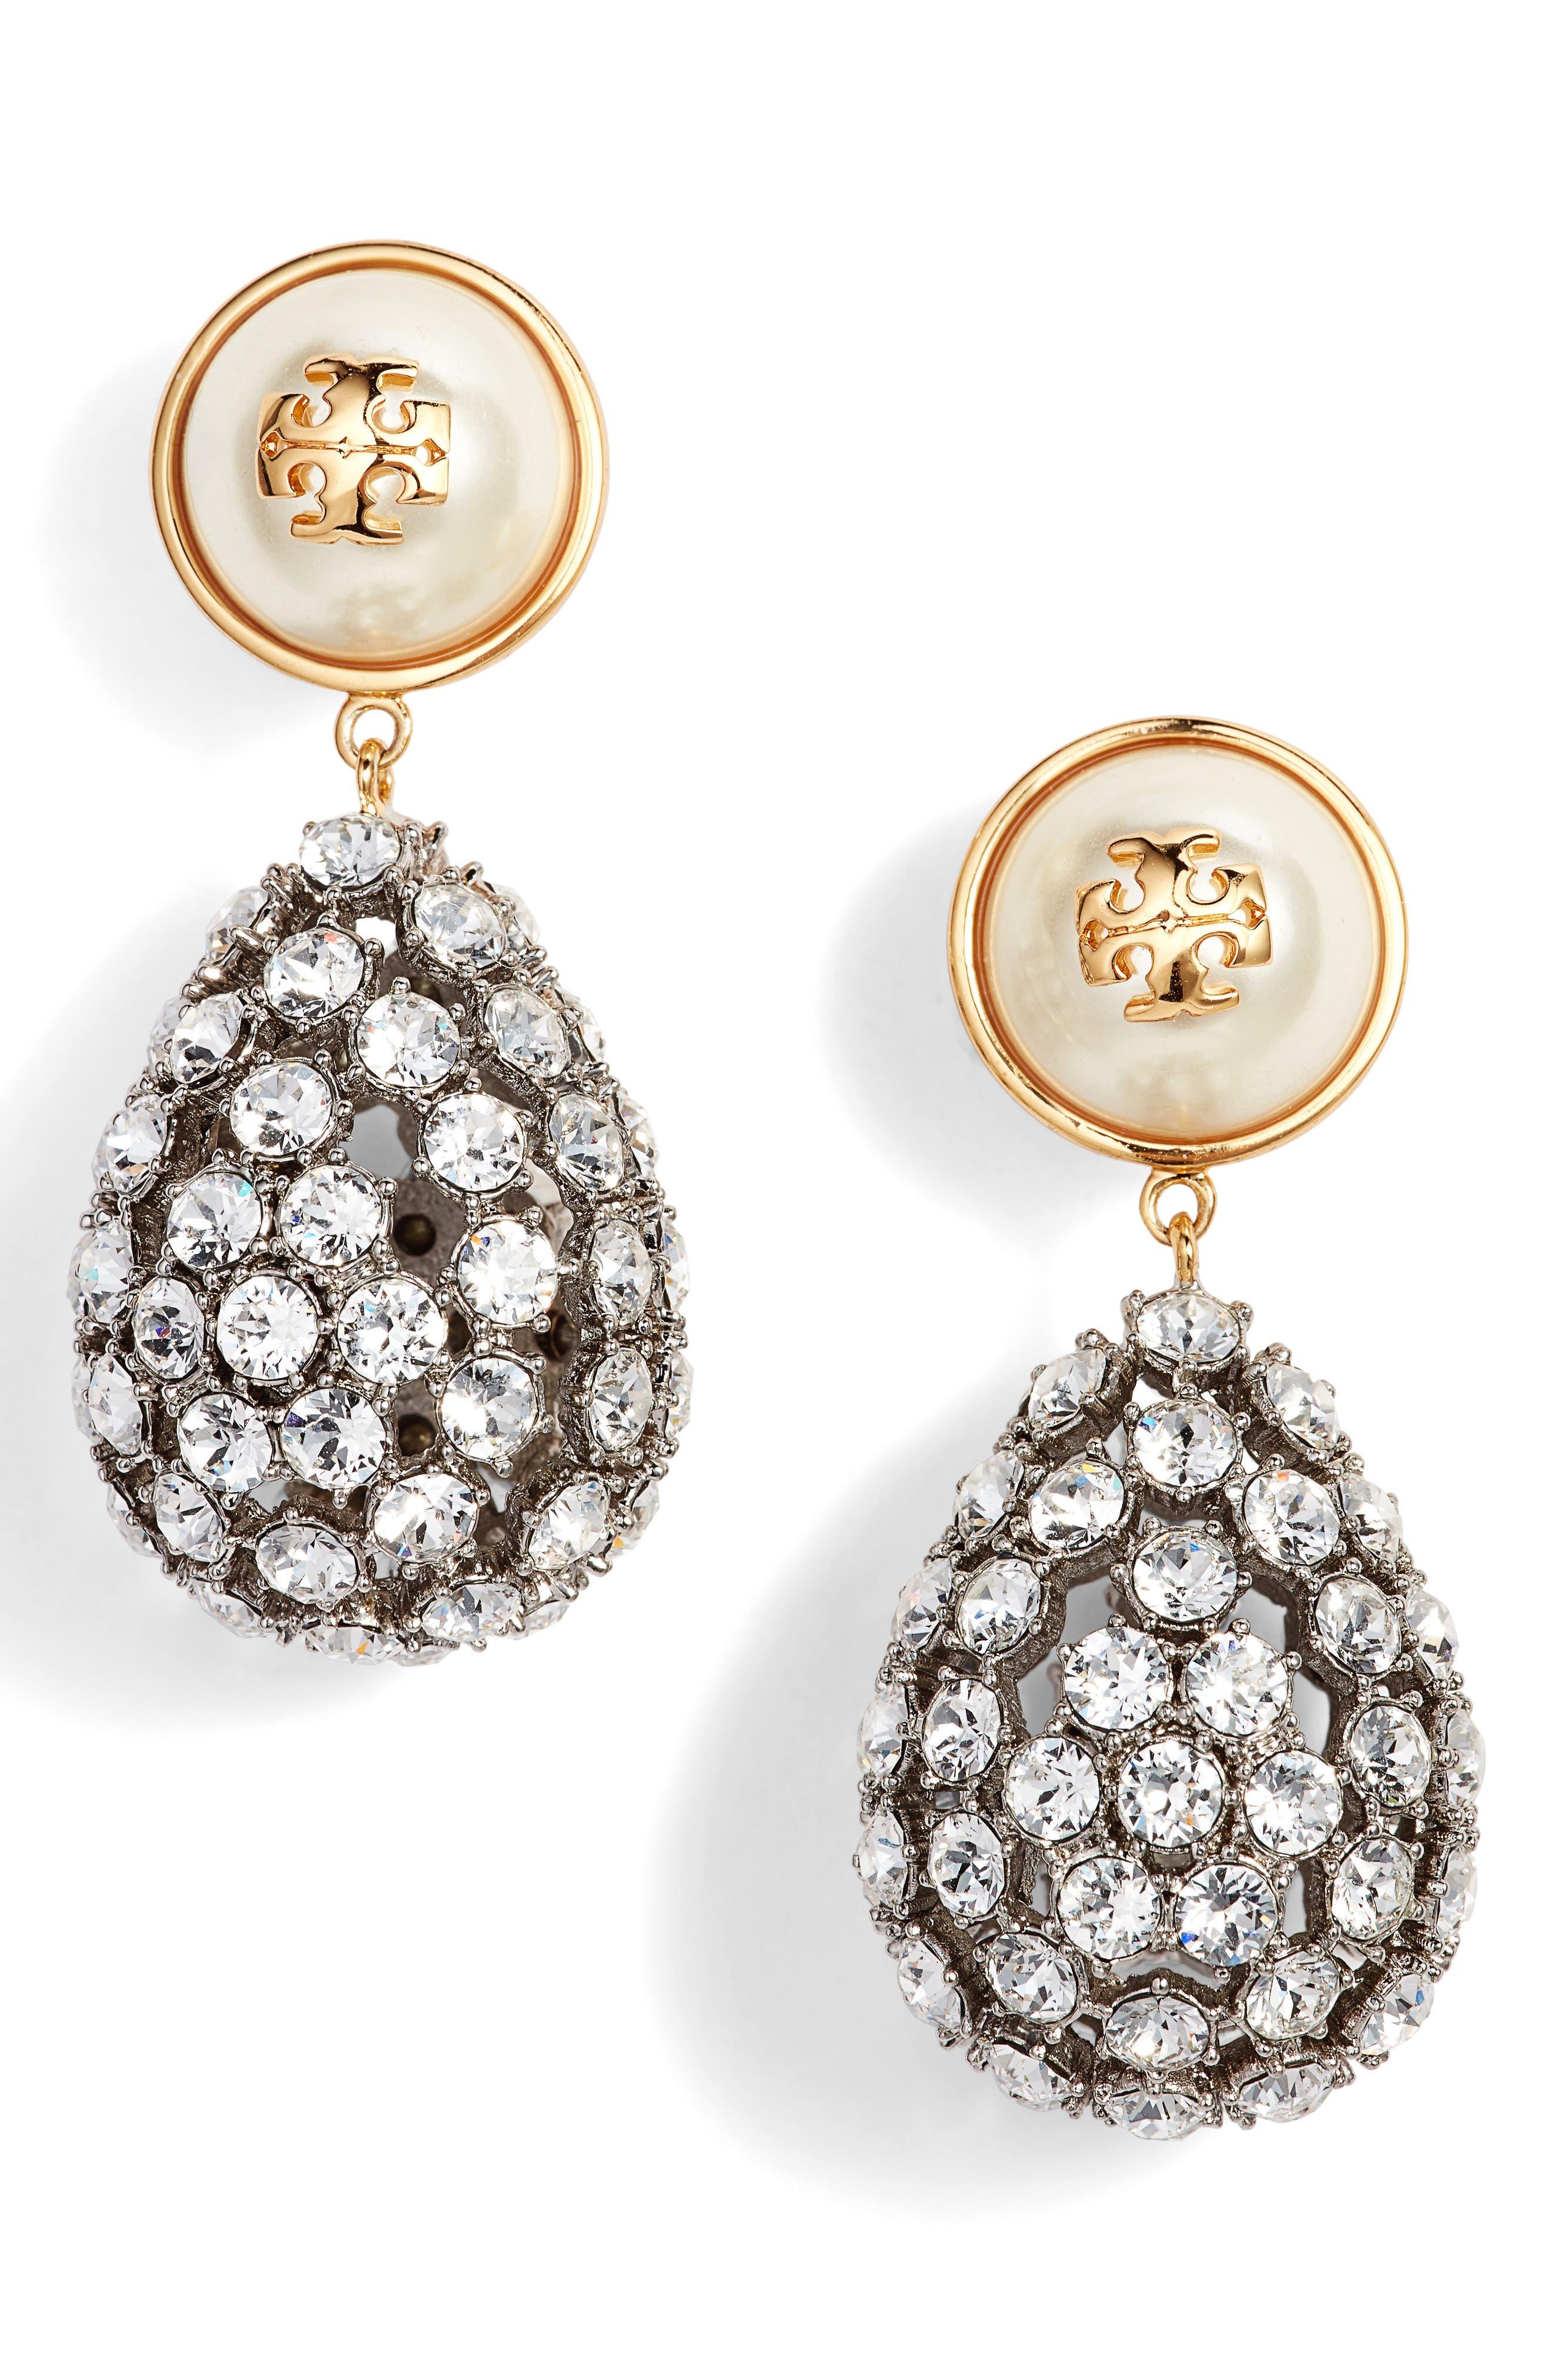 Alternate Image 1 Selected - Tory Burch Imitation Pearl Statement Drop Earrings